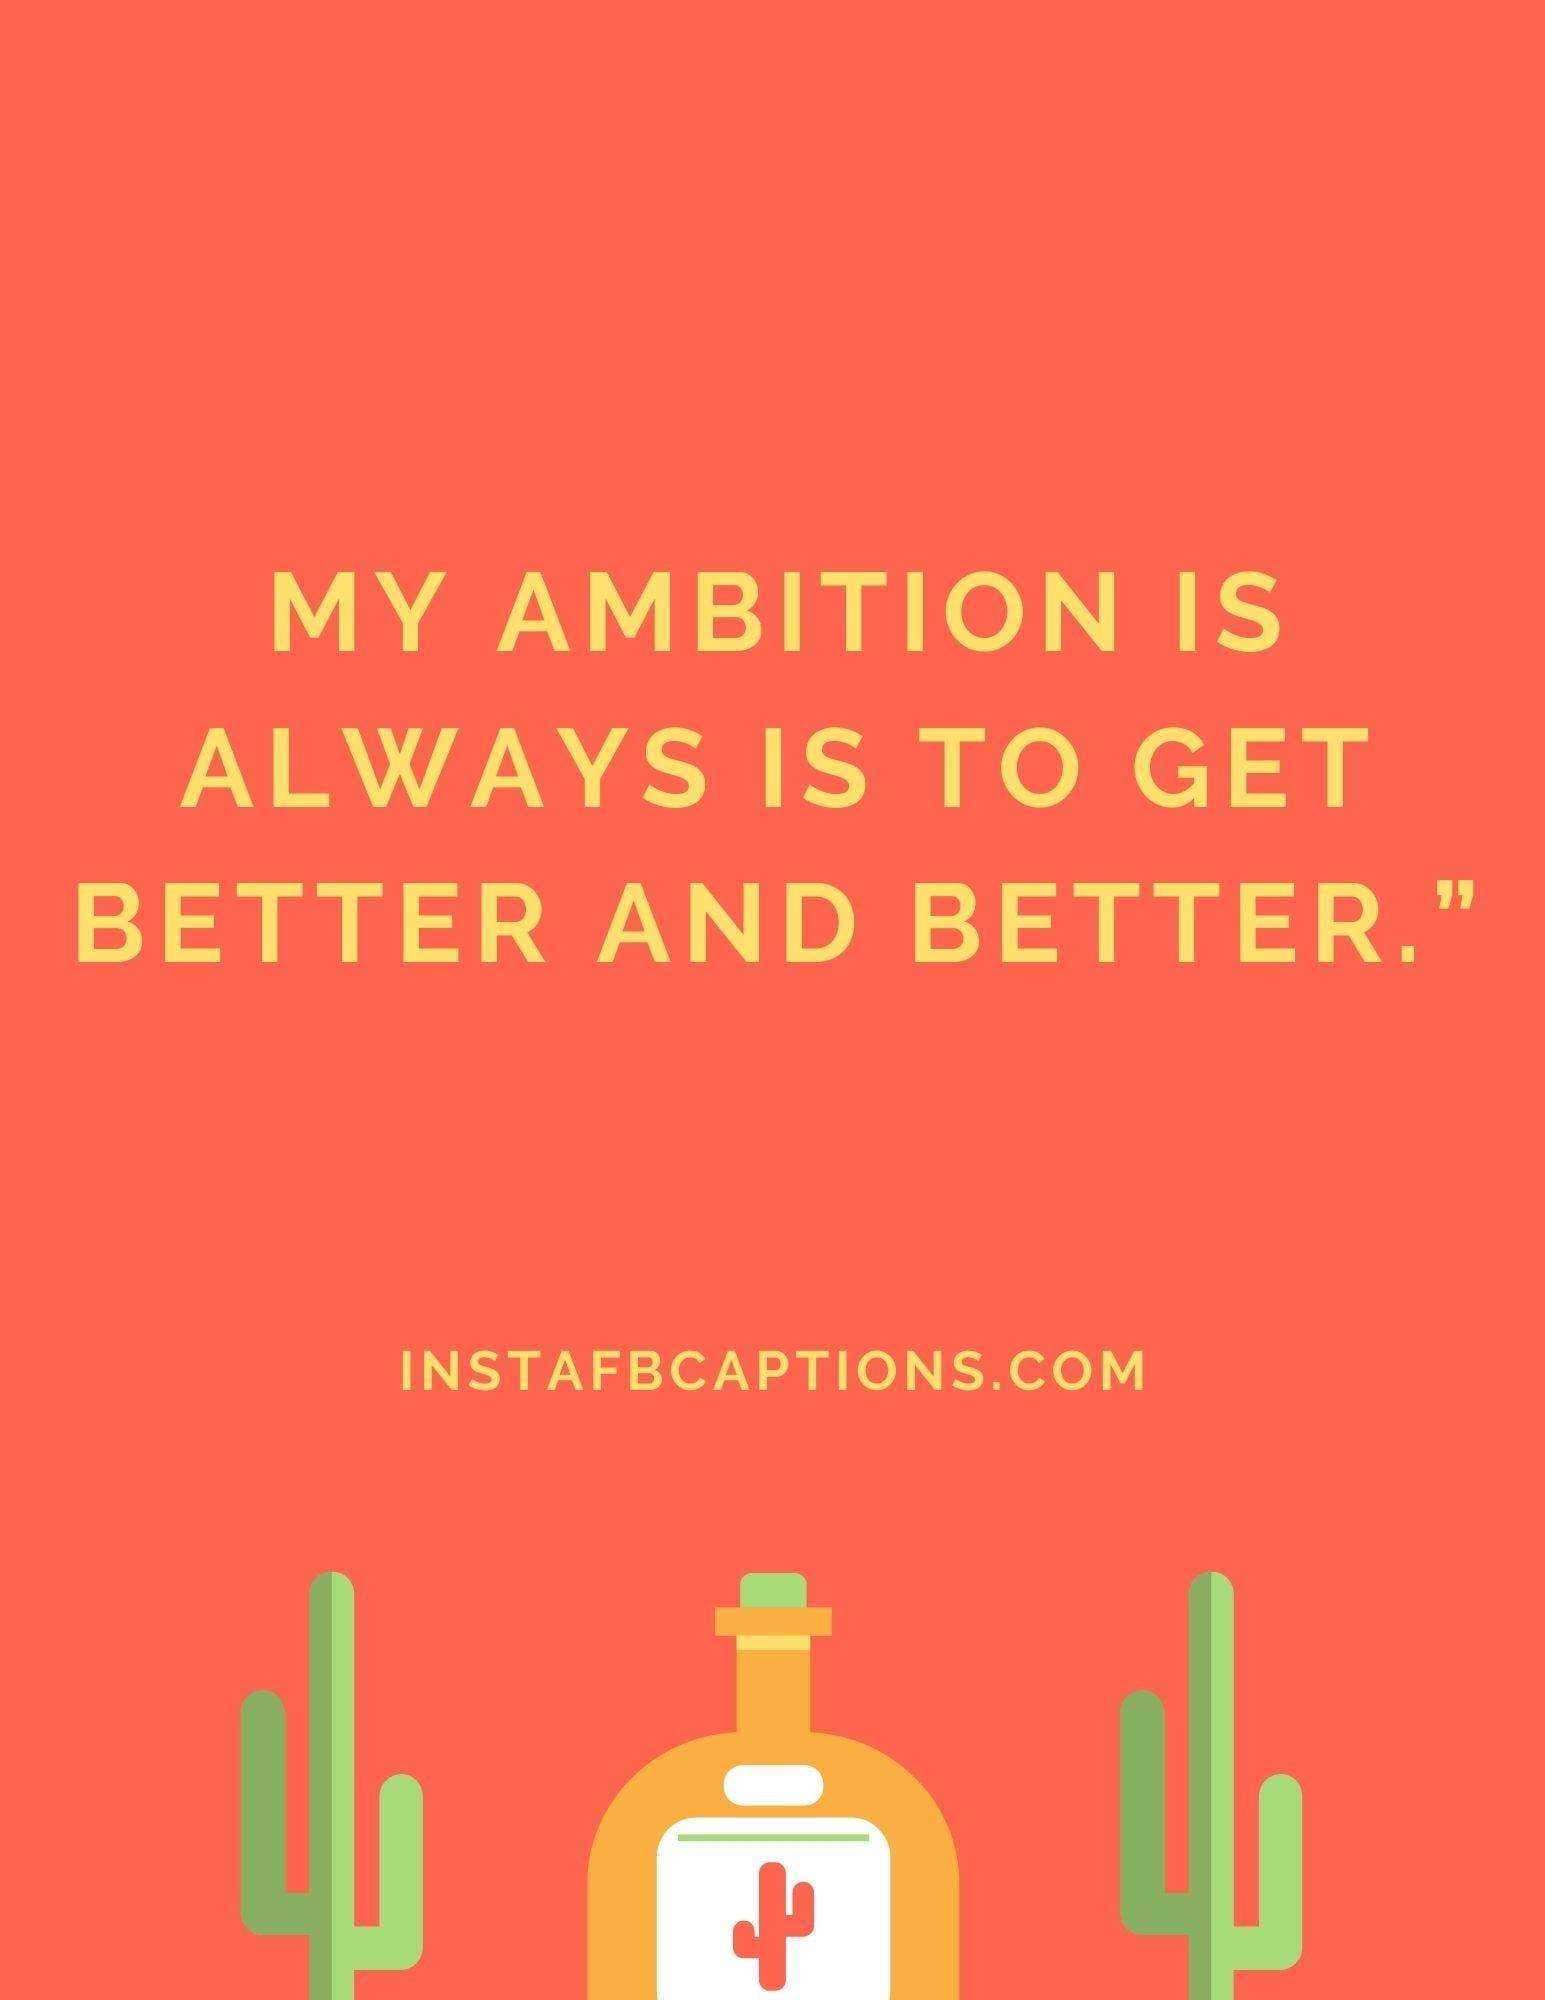 Negative Ambition Captions  - Negative Ambition Captions - Optimistic Ambition Captions for Positivity in 2021